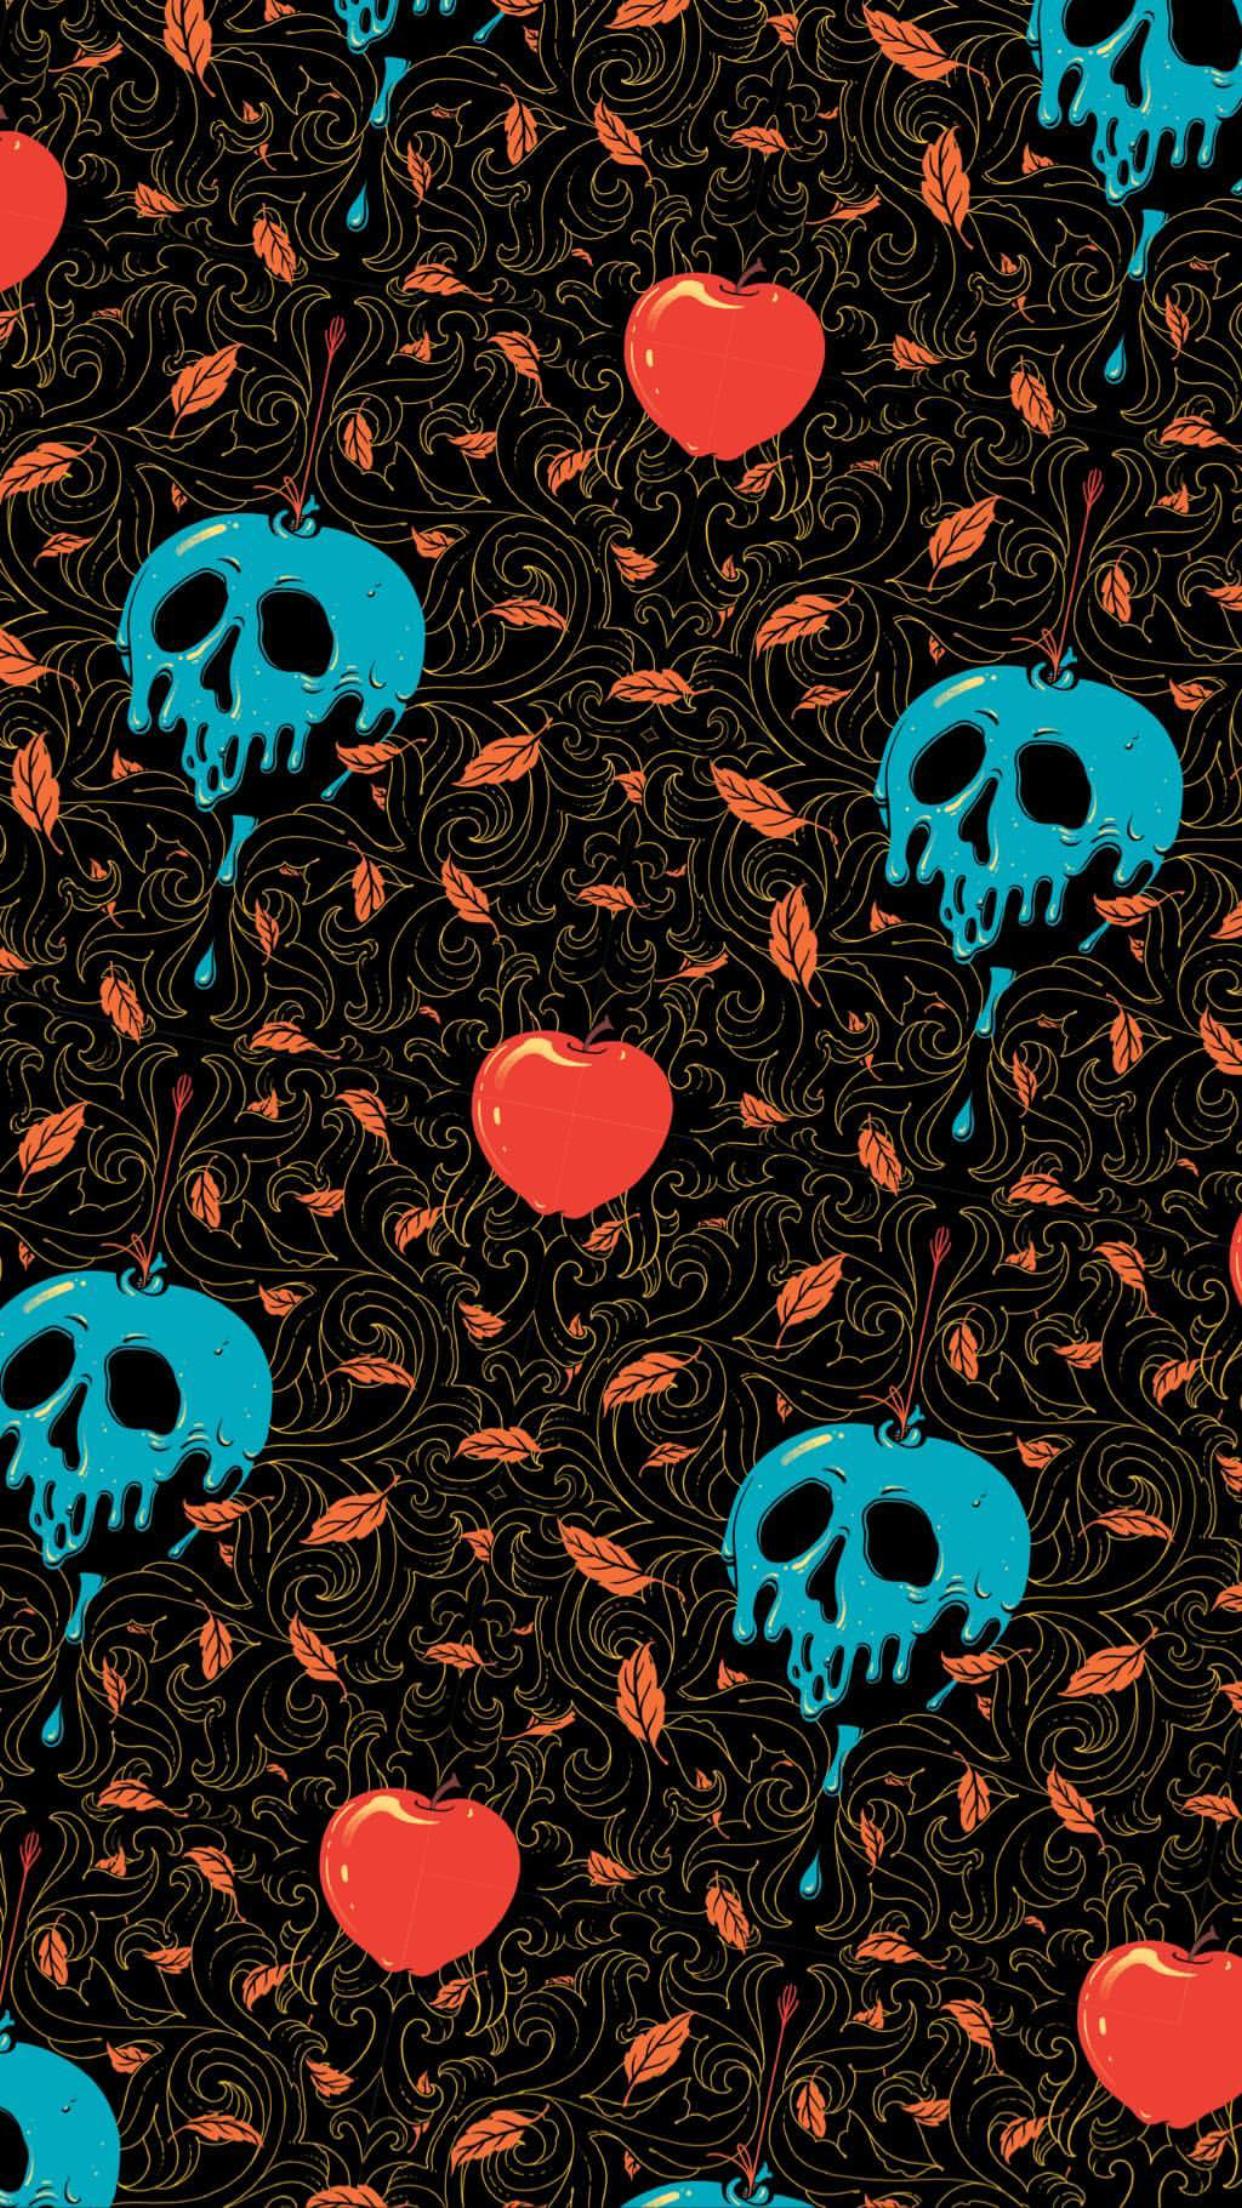 Pin by Felicia on Disney Halloween wallpaper iphone